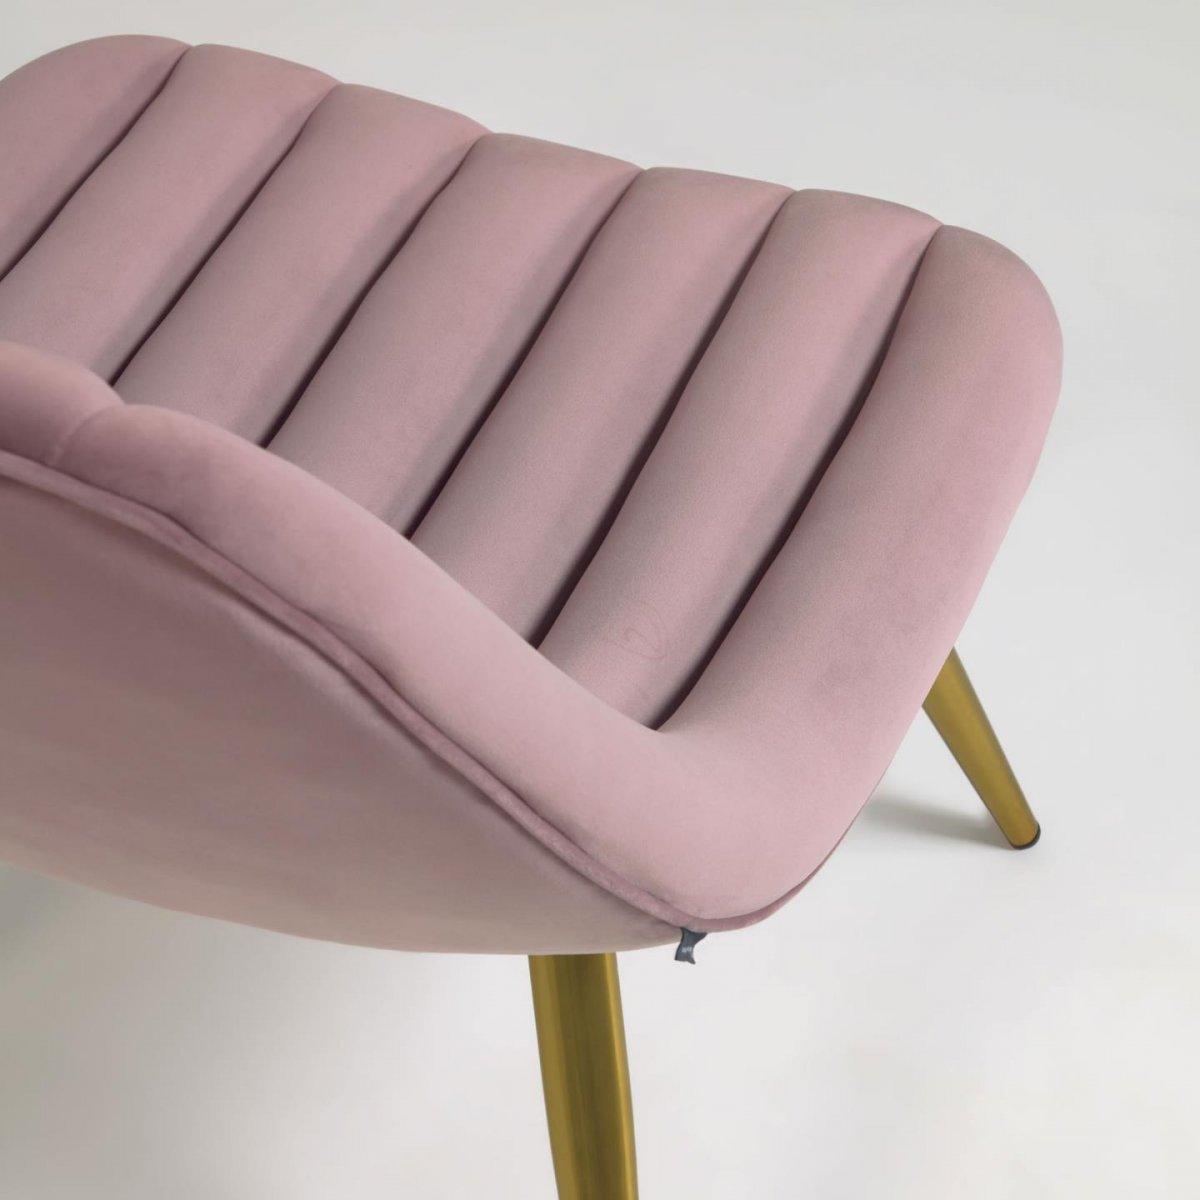 Keihome Linea J Poltrona Marlene in velluto rosa